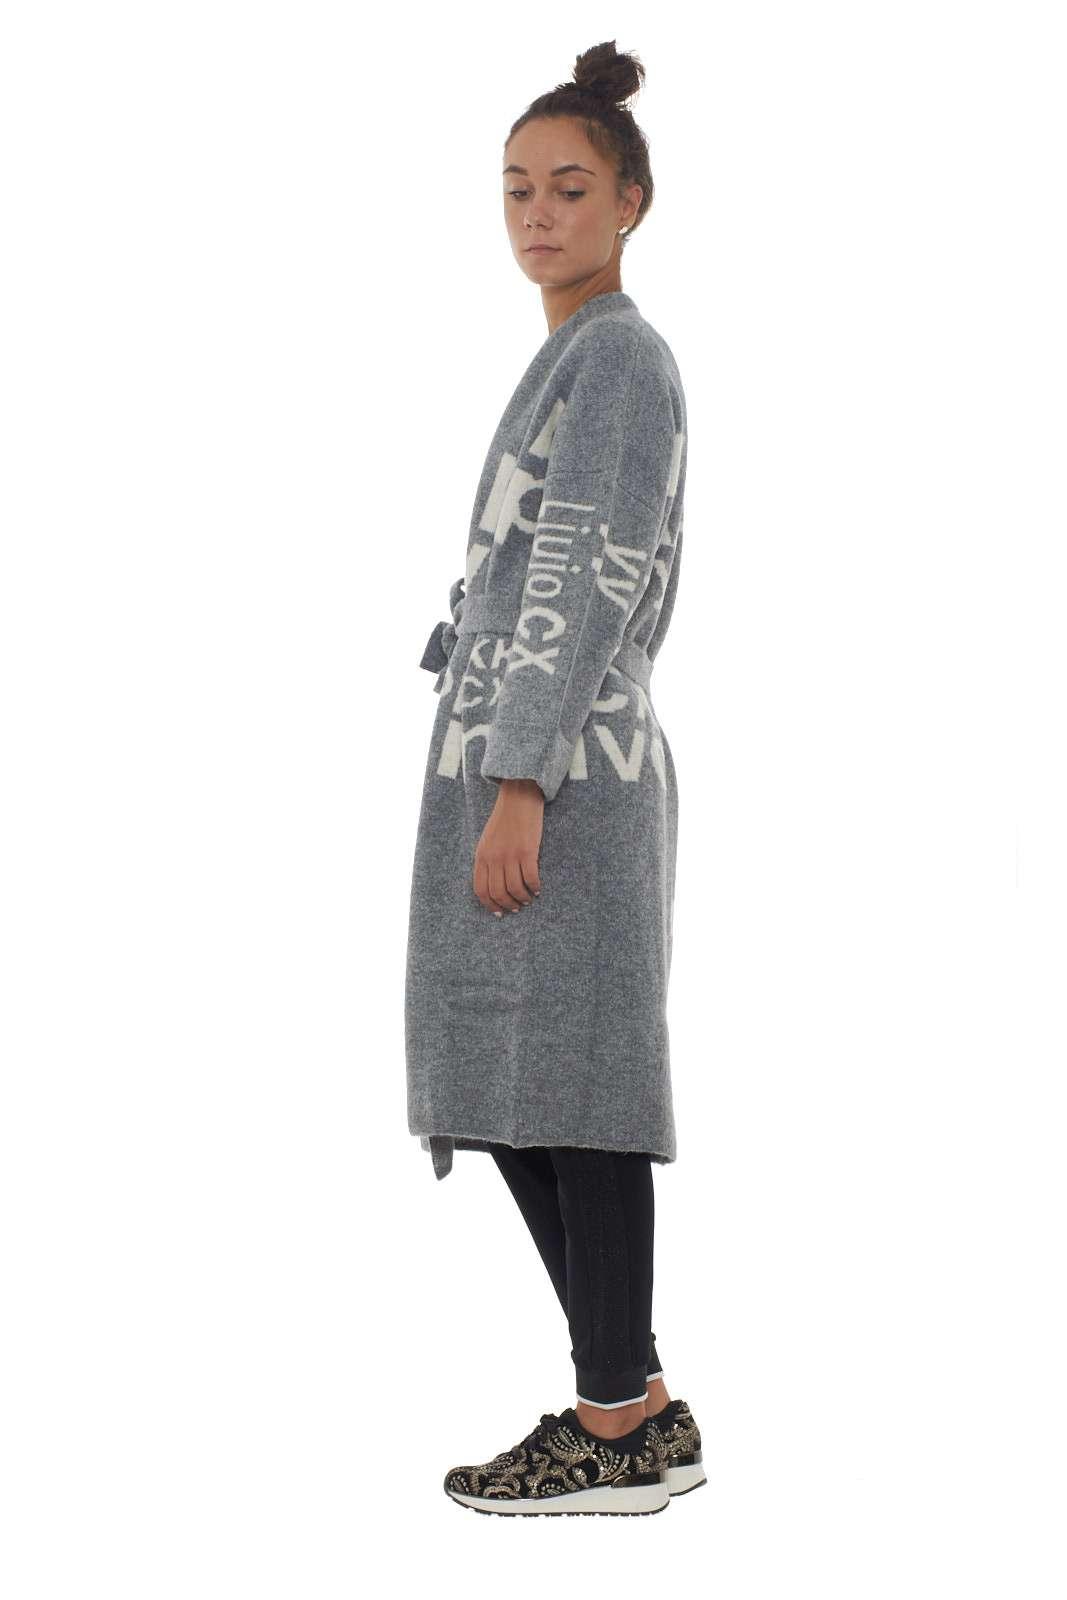 https://www.parmax.com/media/catalog/product/a/i/AI-outlet_parmax-cardigan-donna-Liu-Jo-T69184-B.jpg